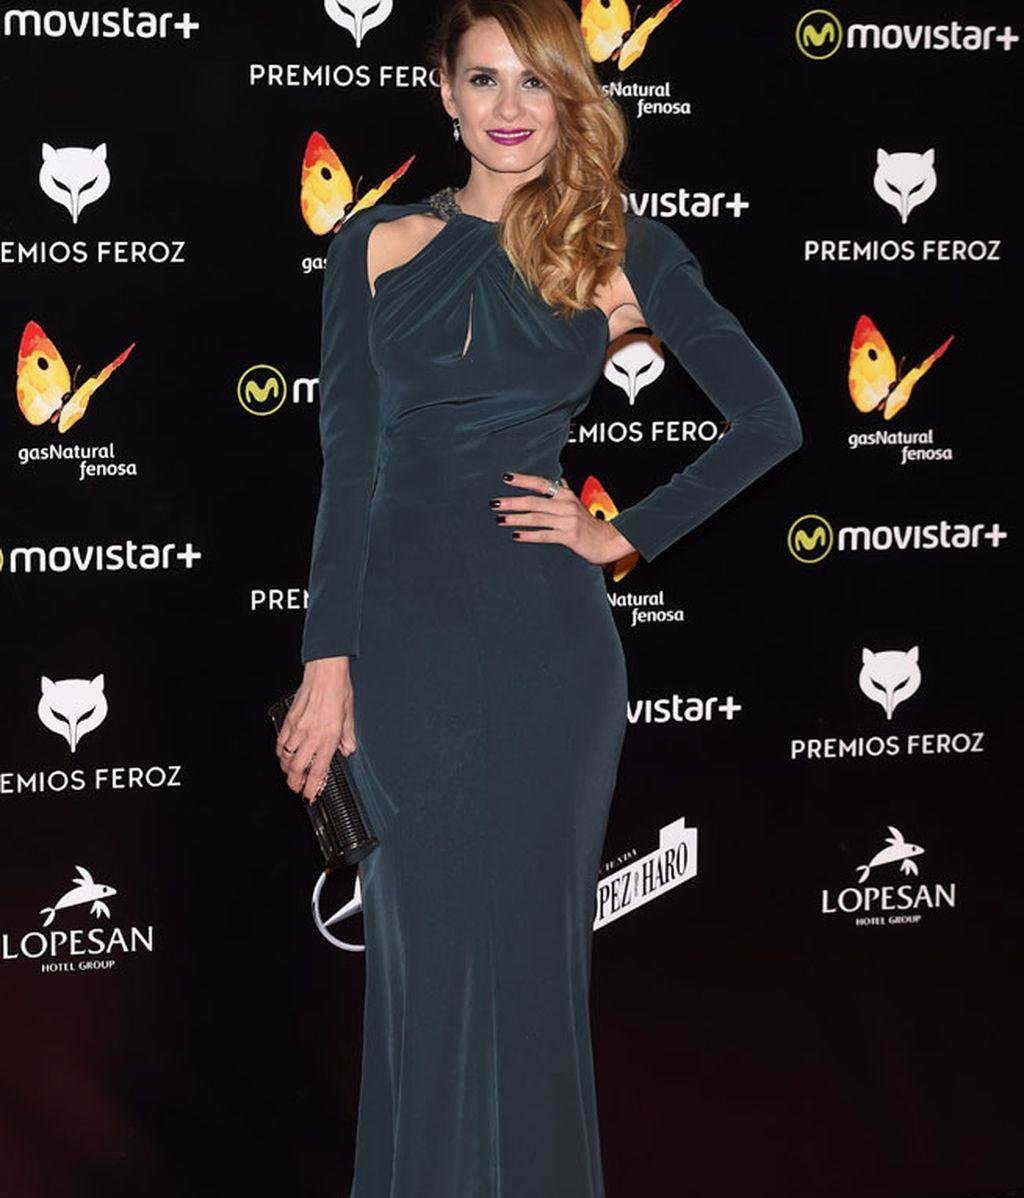 Elena Ballesteros optó por el terciopelo plomo